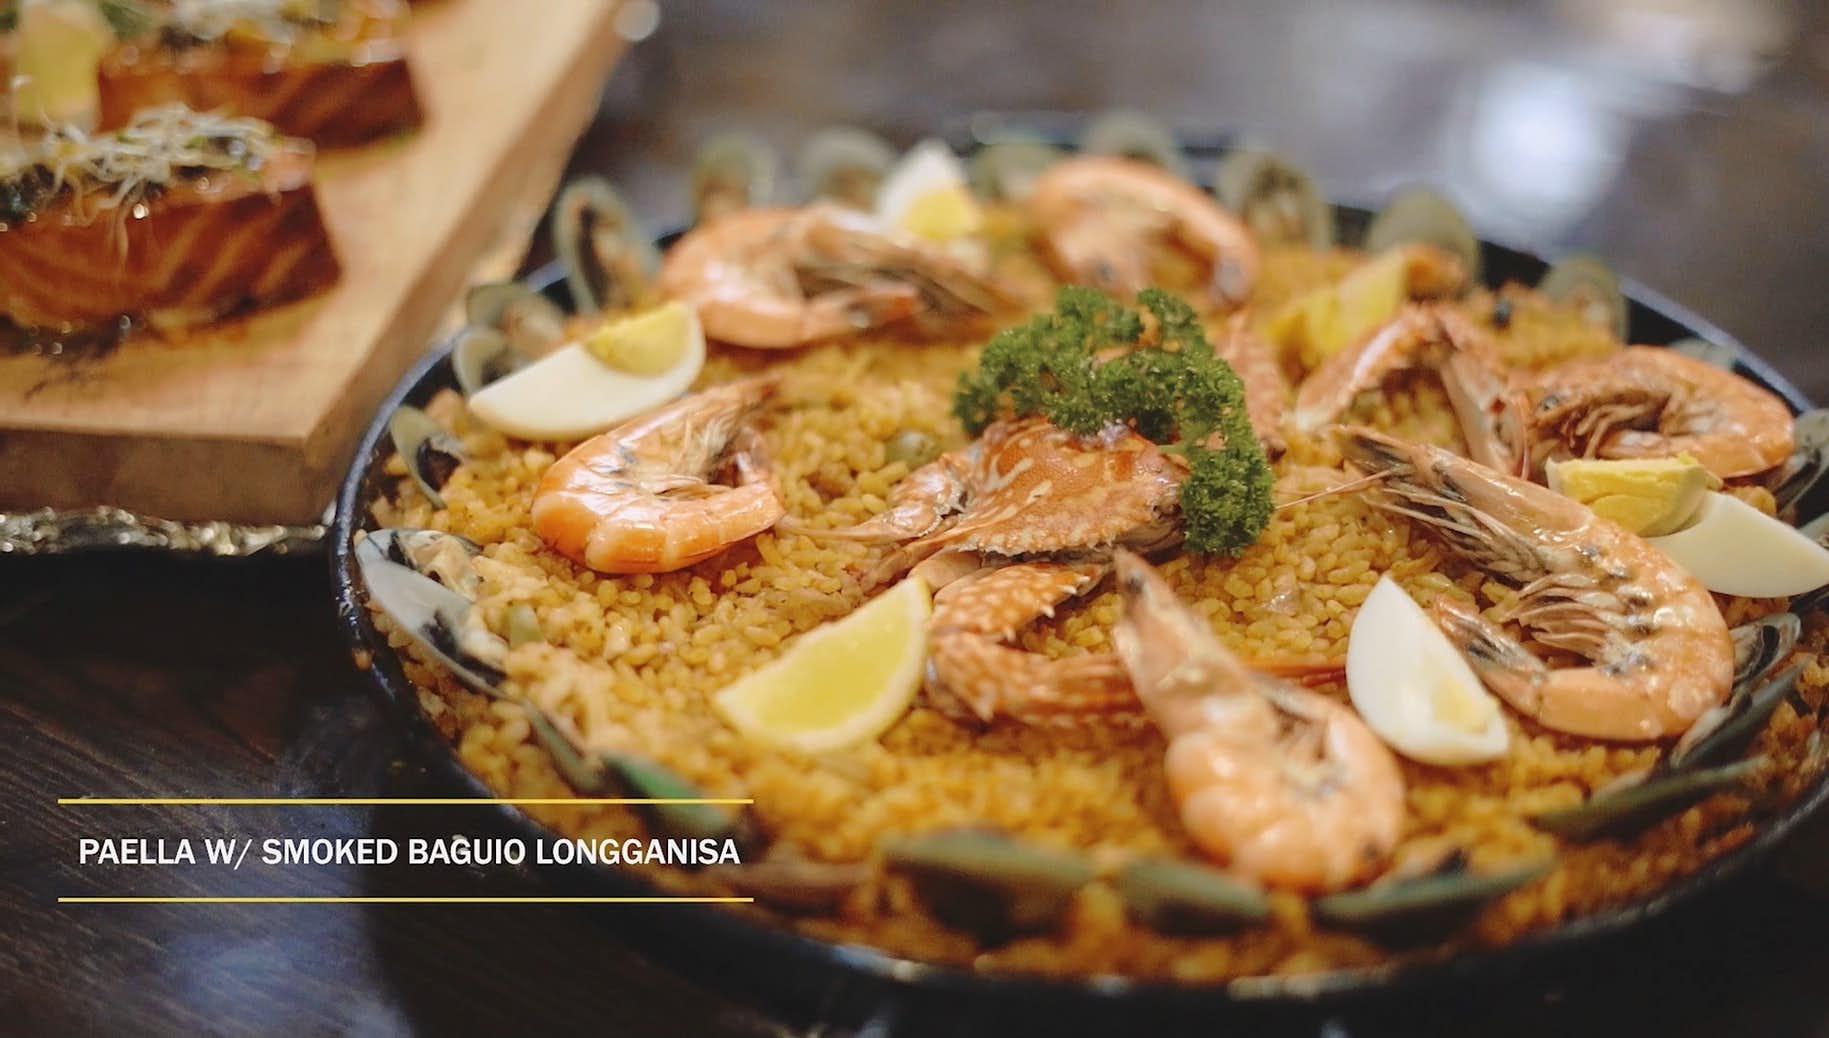 Paella served at Cocina del Sol in Baguio